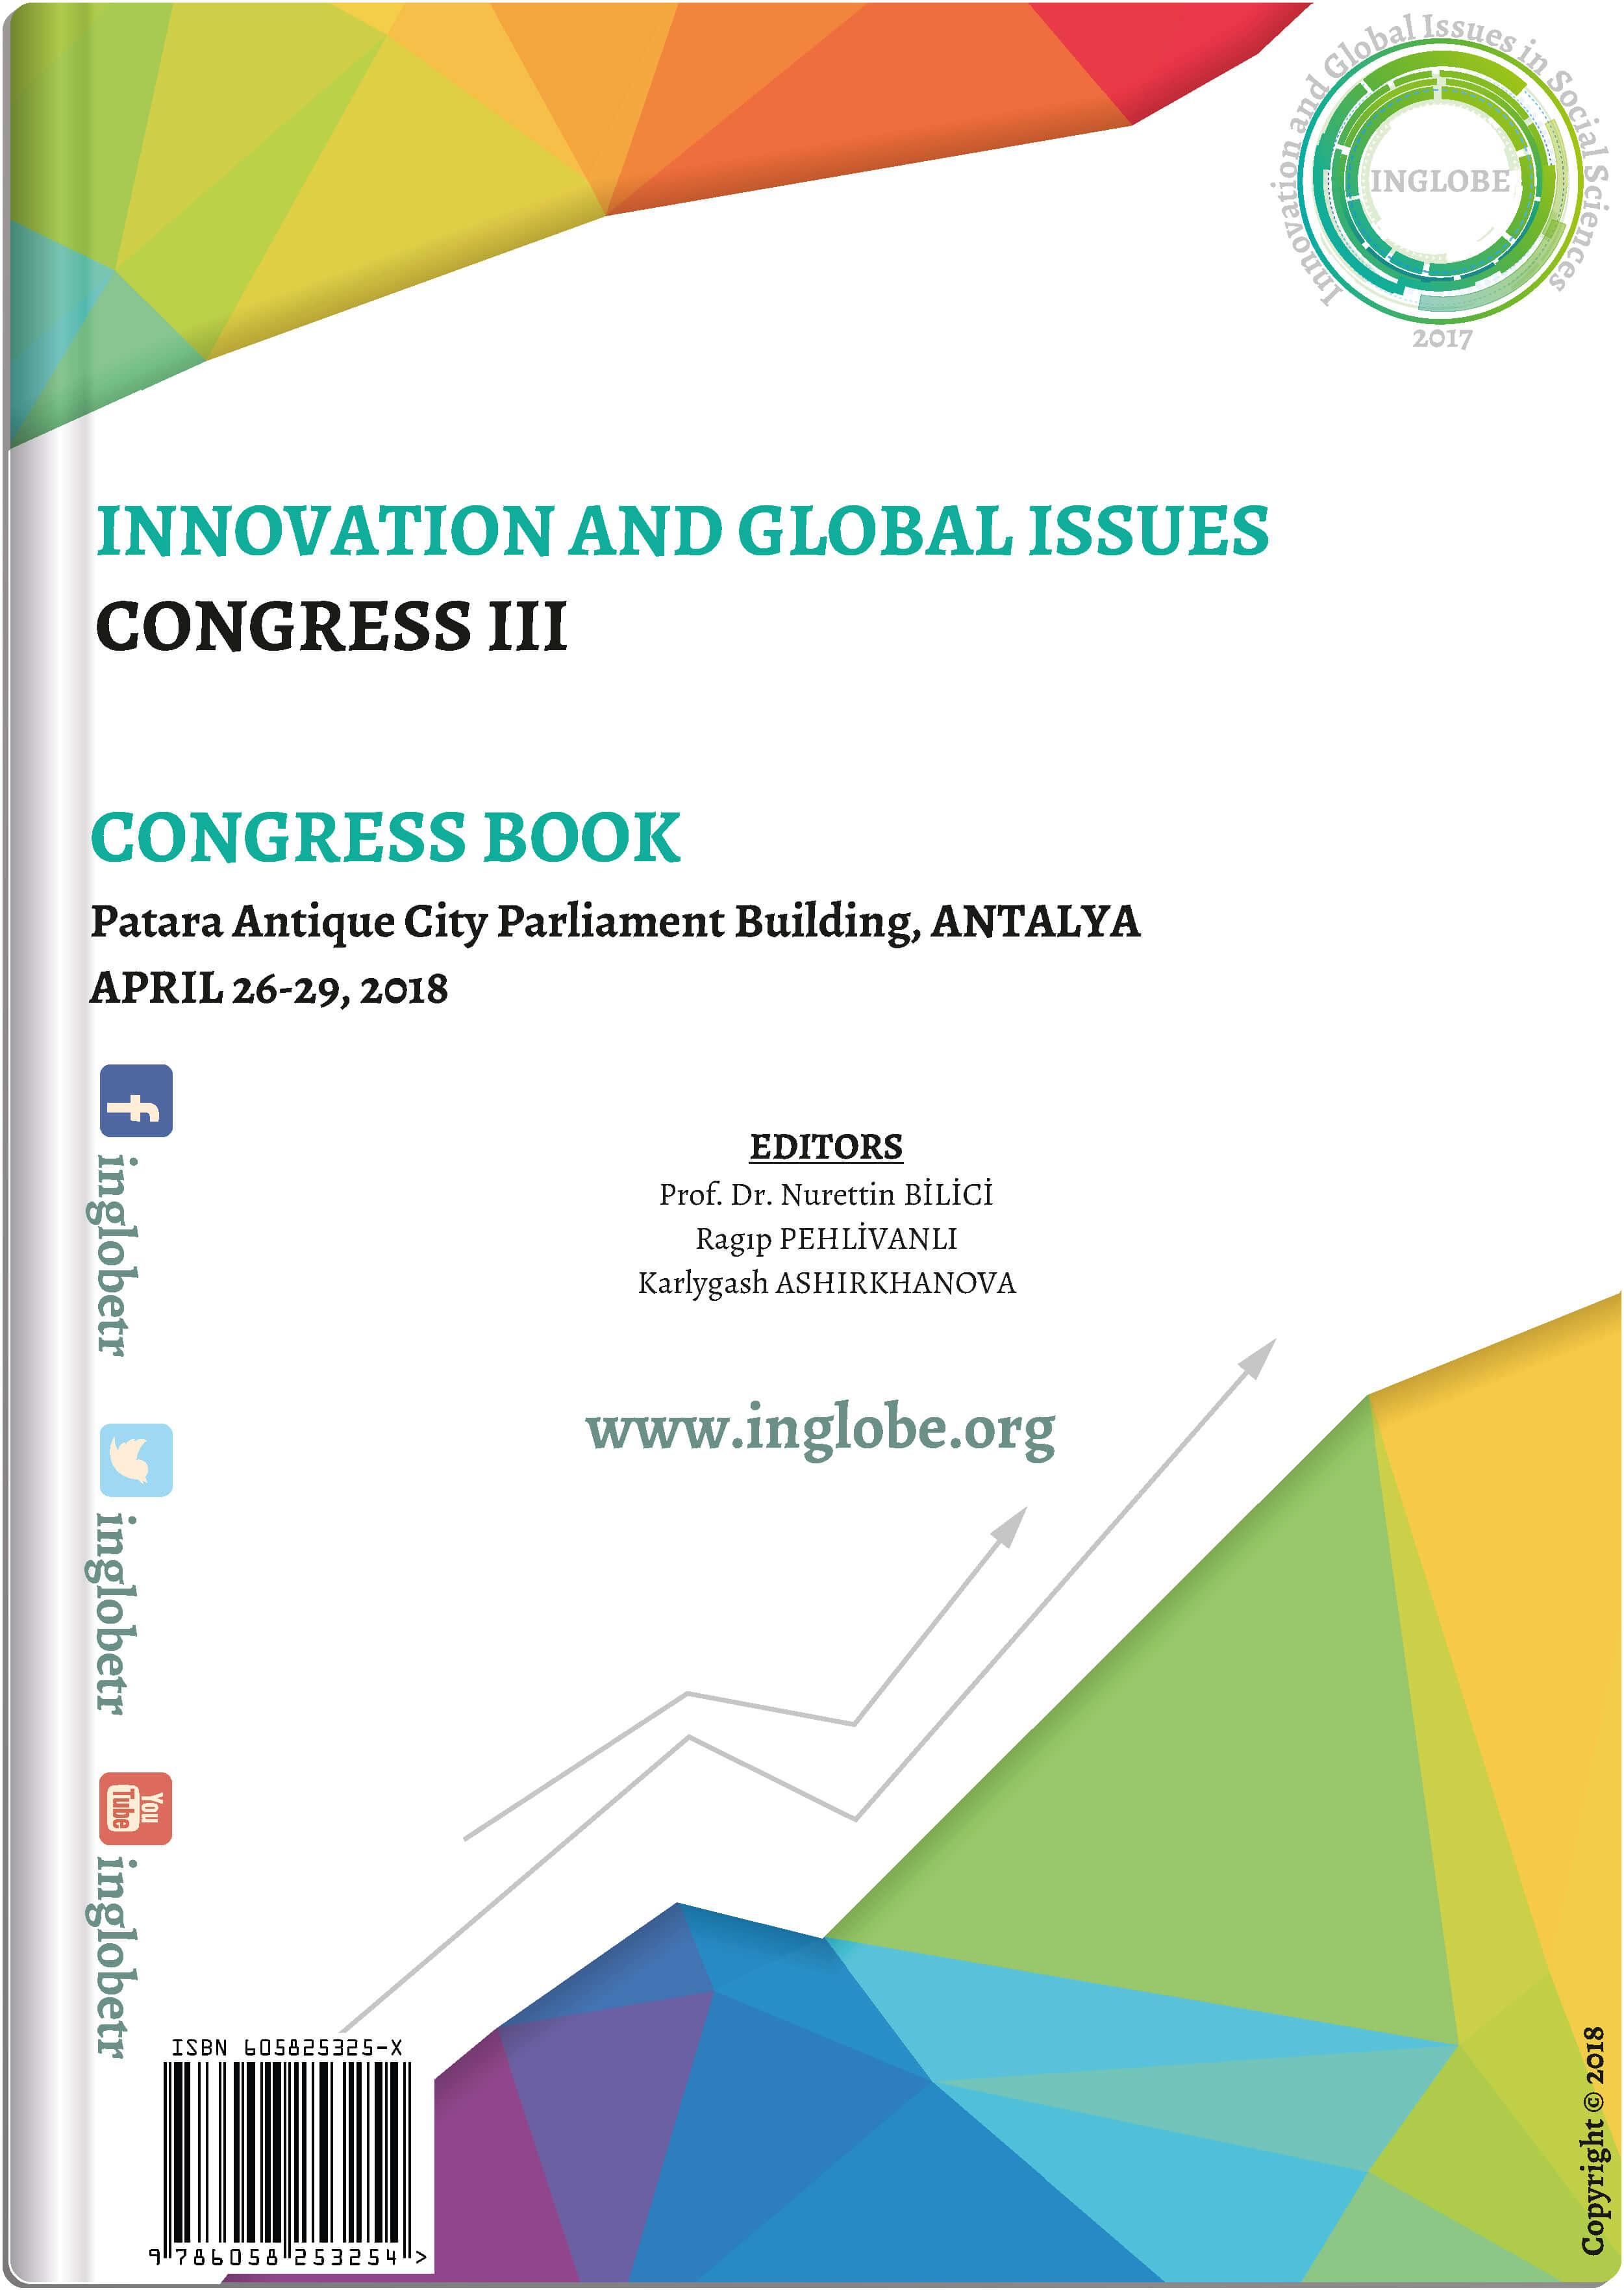 inglobe3_congress_book_v7_Sayfa_0001